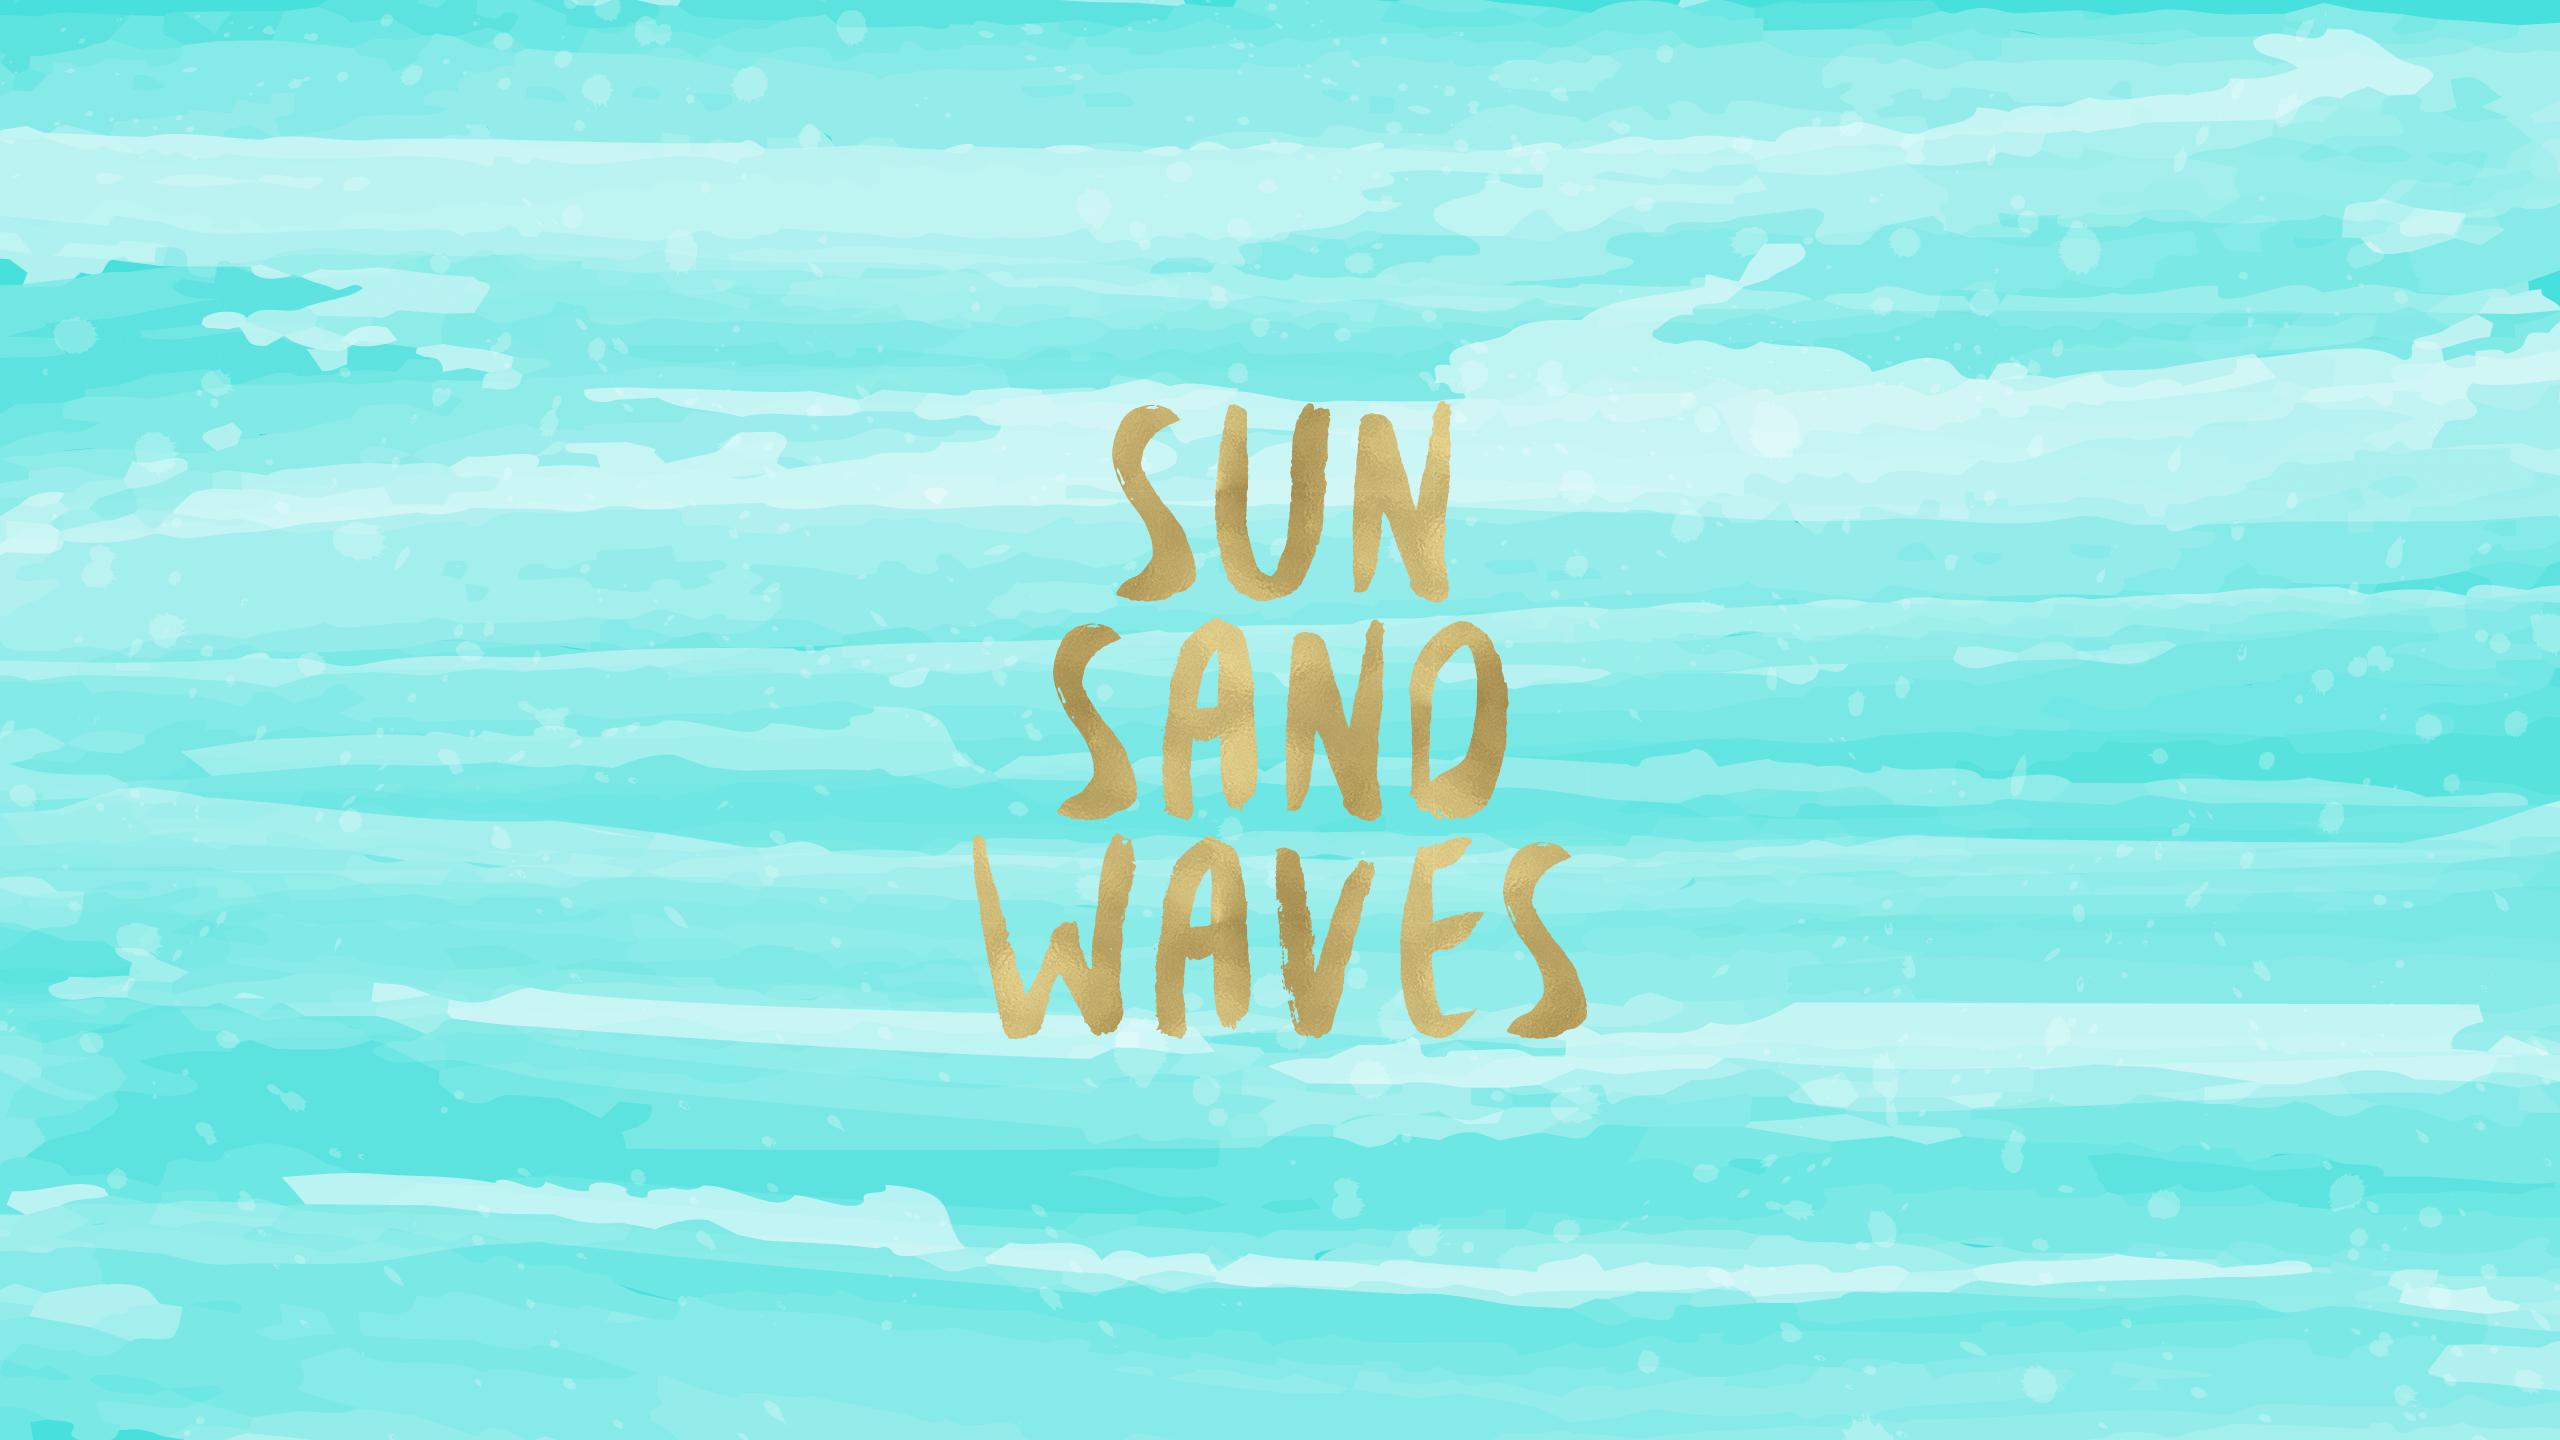 Sun sand waves free desktop wallpaper wallpapers and - Pin up desktop backgrounds ...